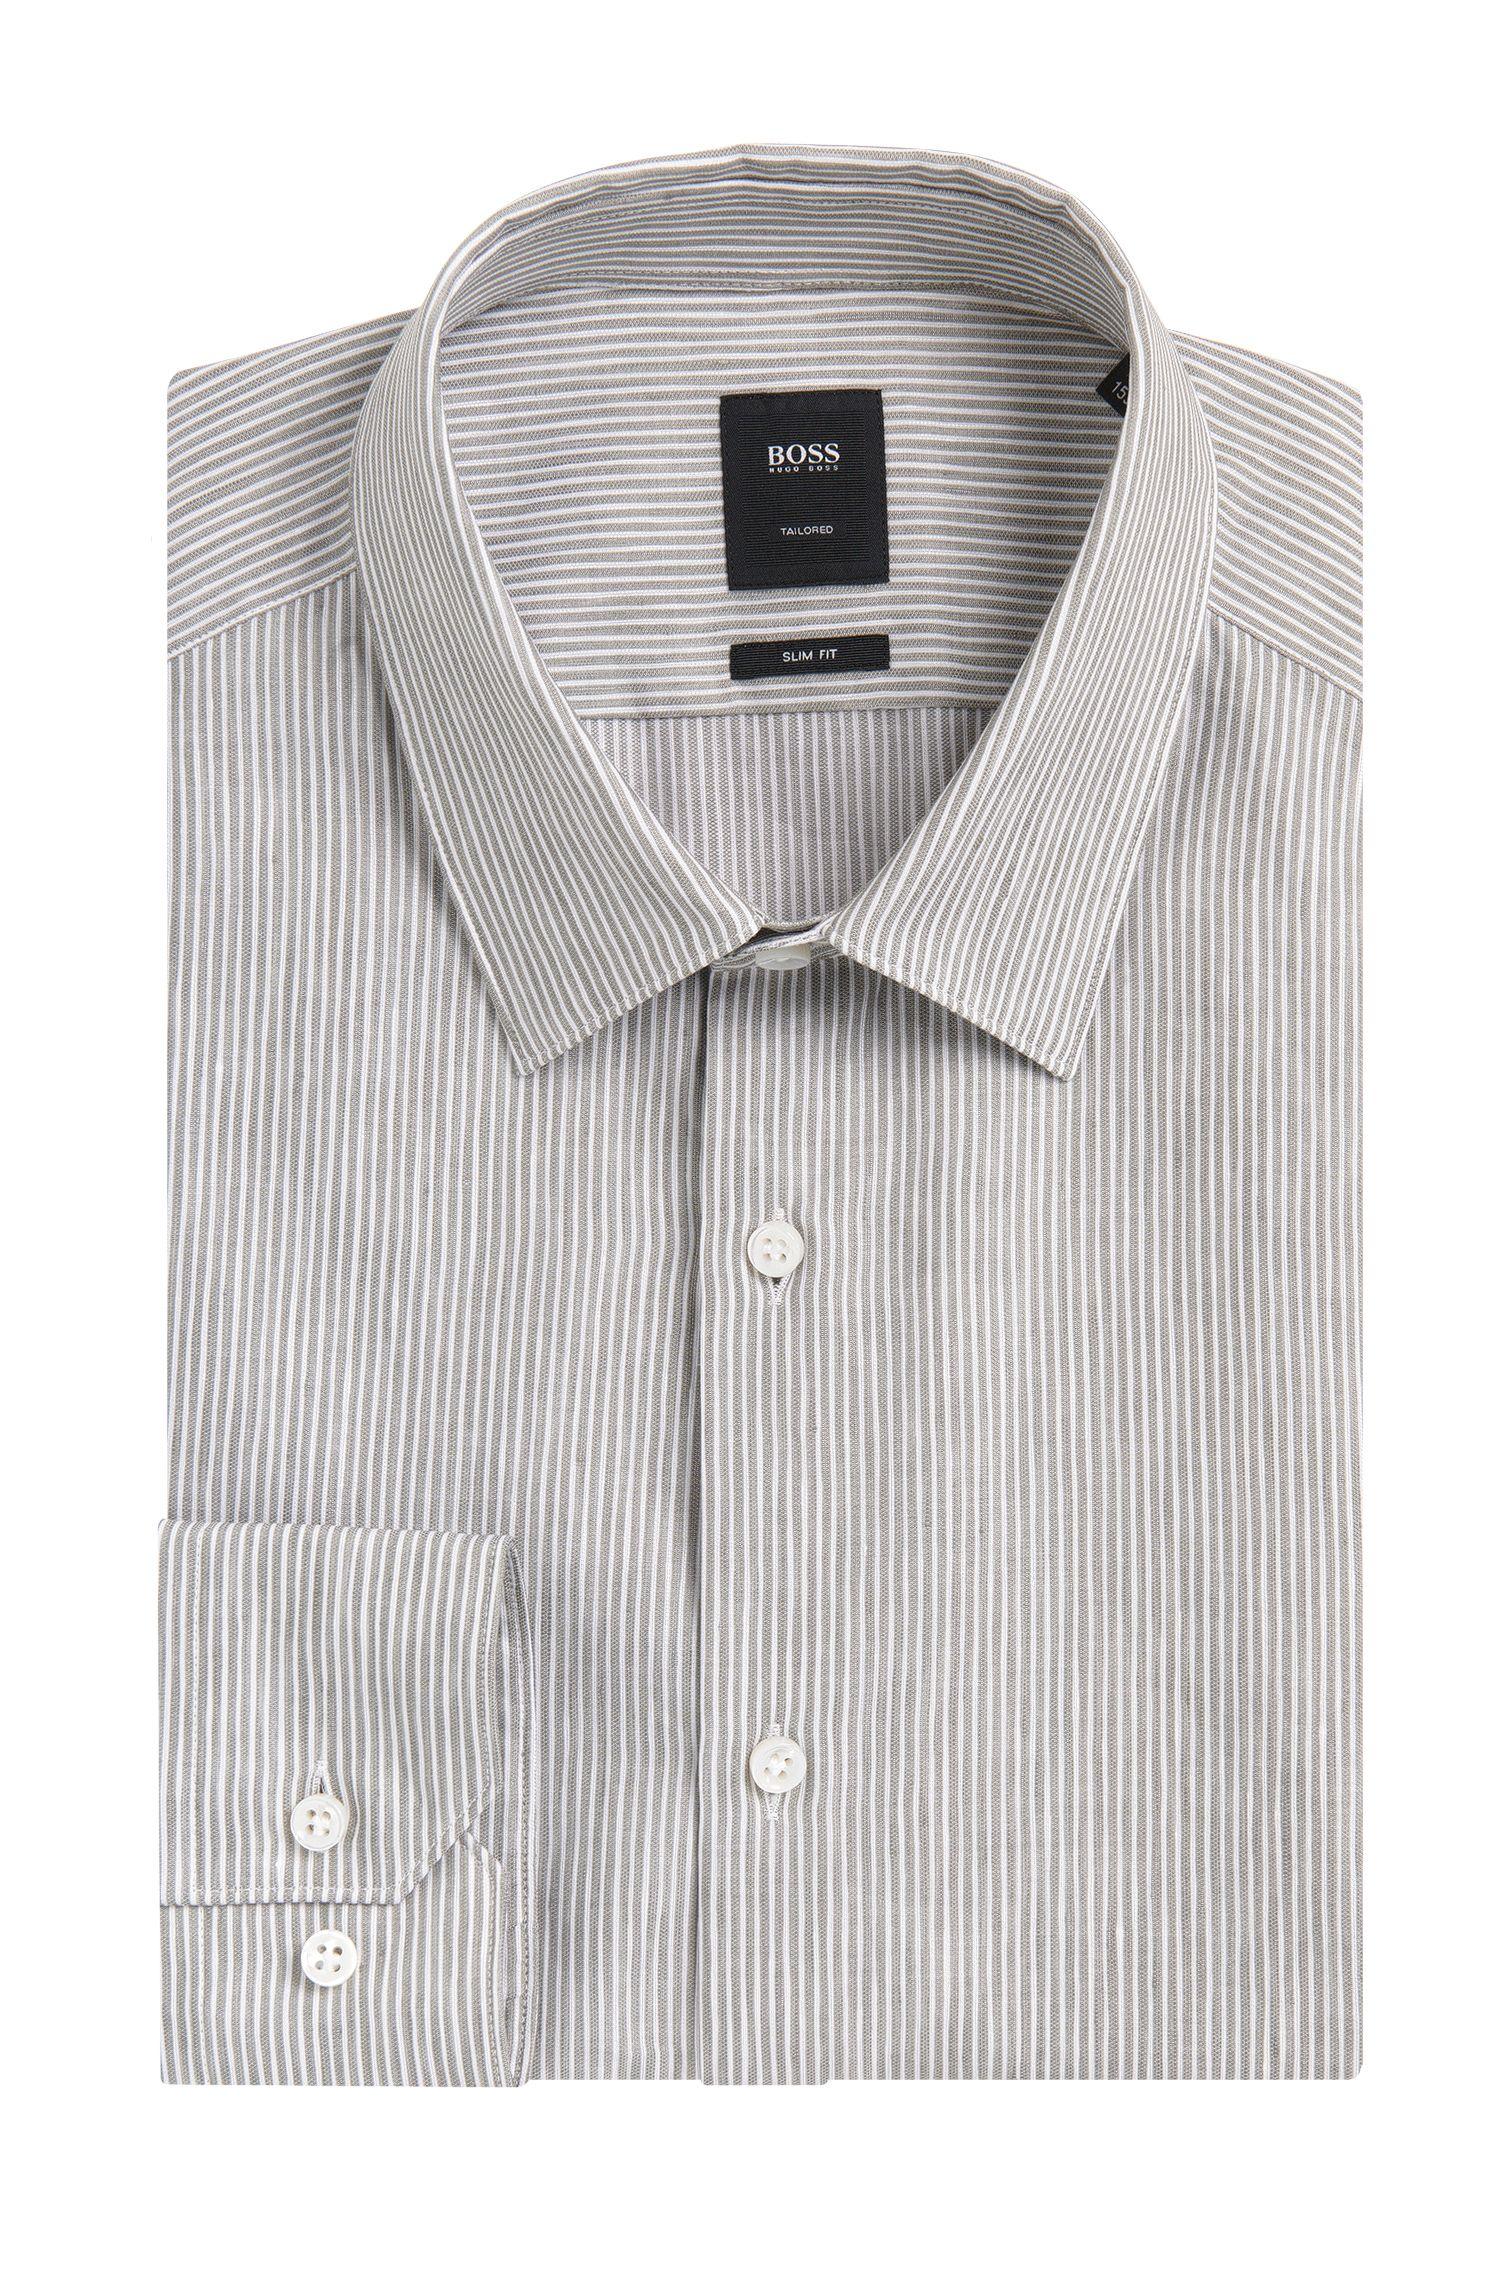 'T-Clint'   Slim Fit, Italian Linen Cotton Dress Shirt